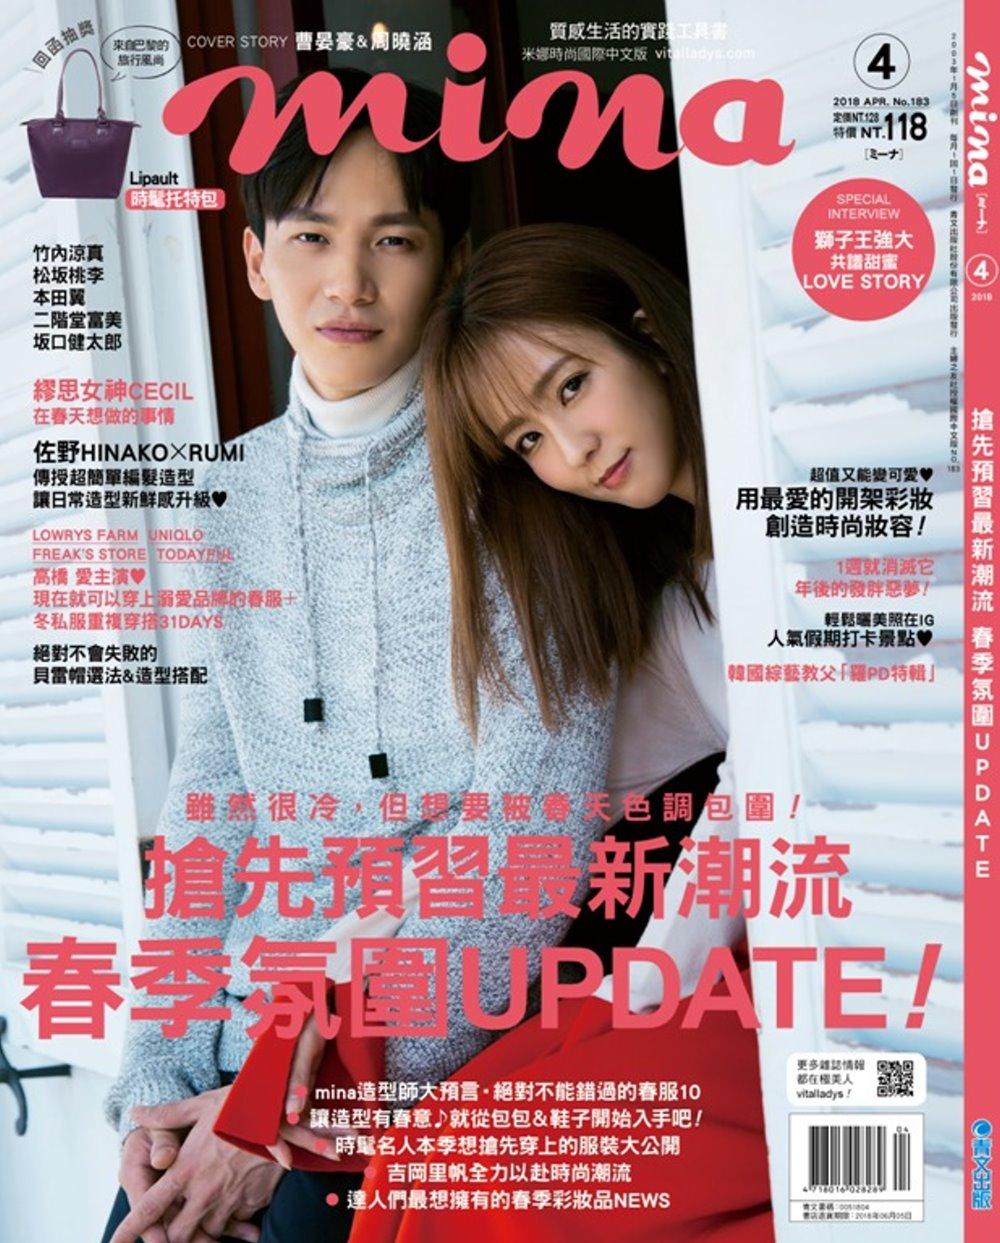 mina米娜時尚國際中文版 4月號/2018 第183期